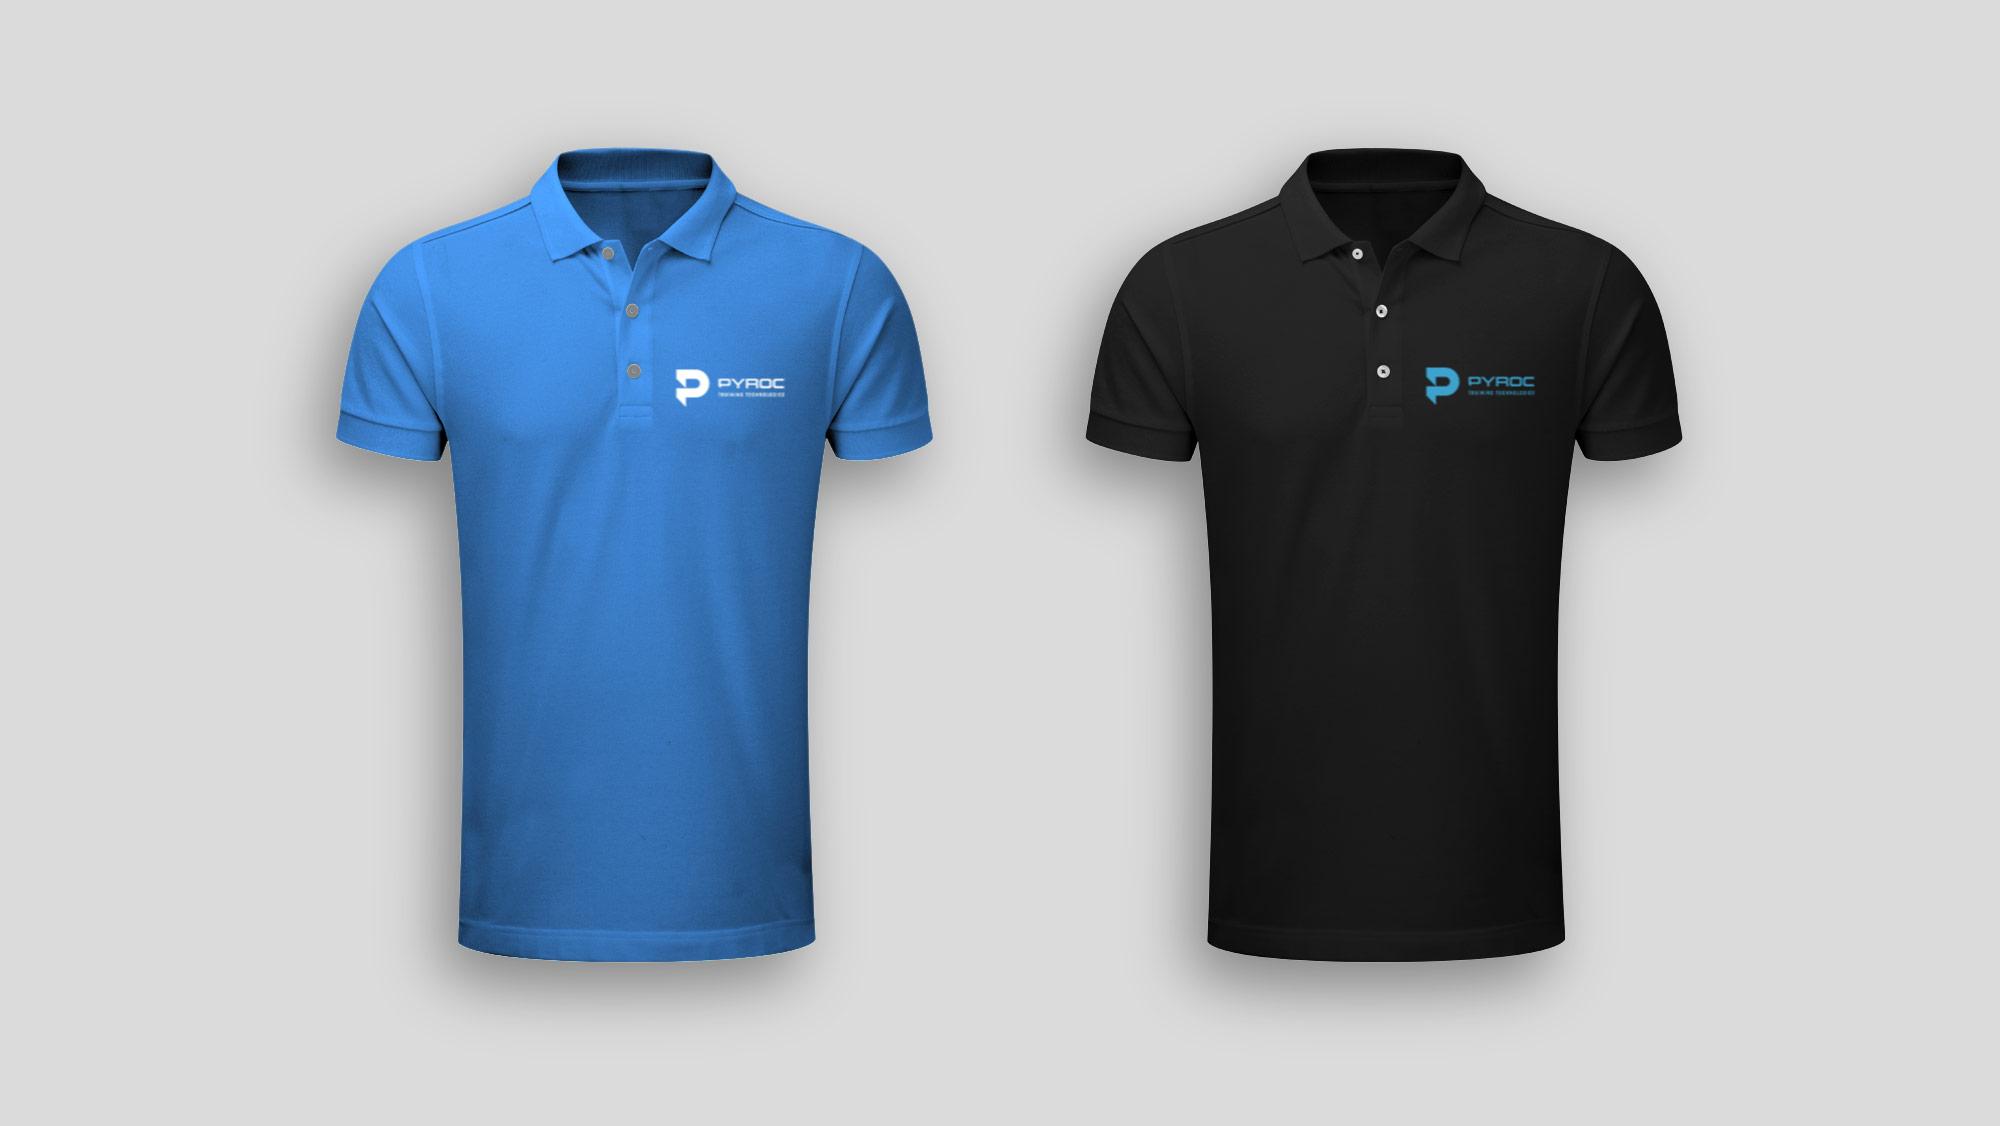 Blue & Black Golf Shirt Design